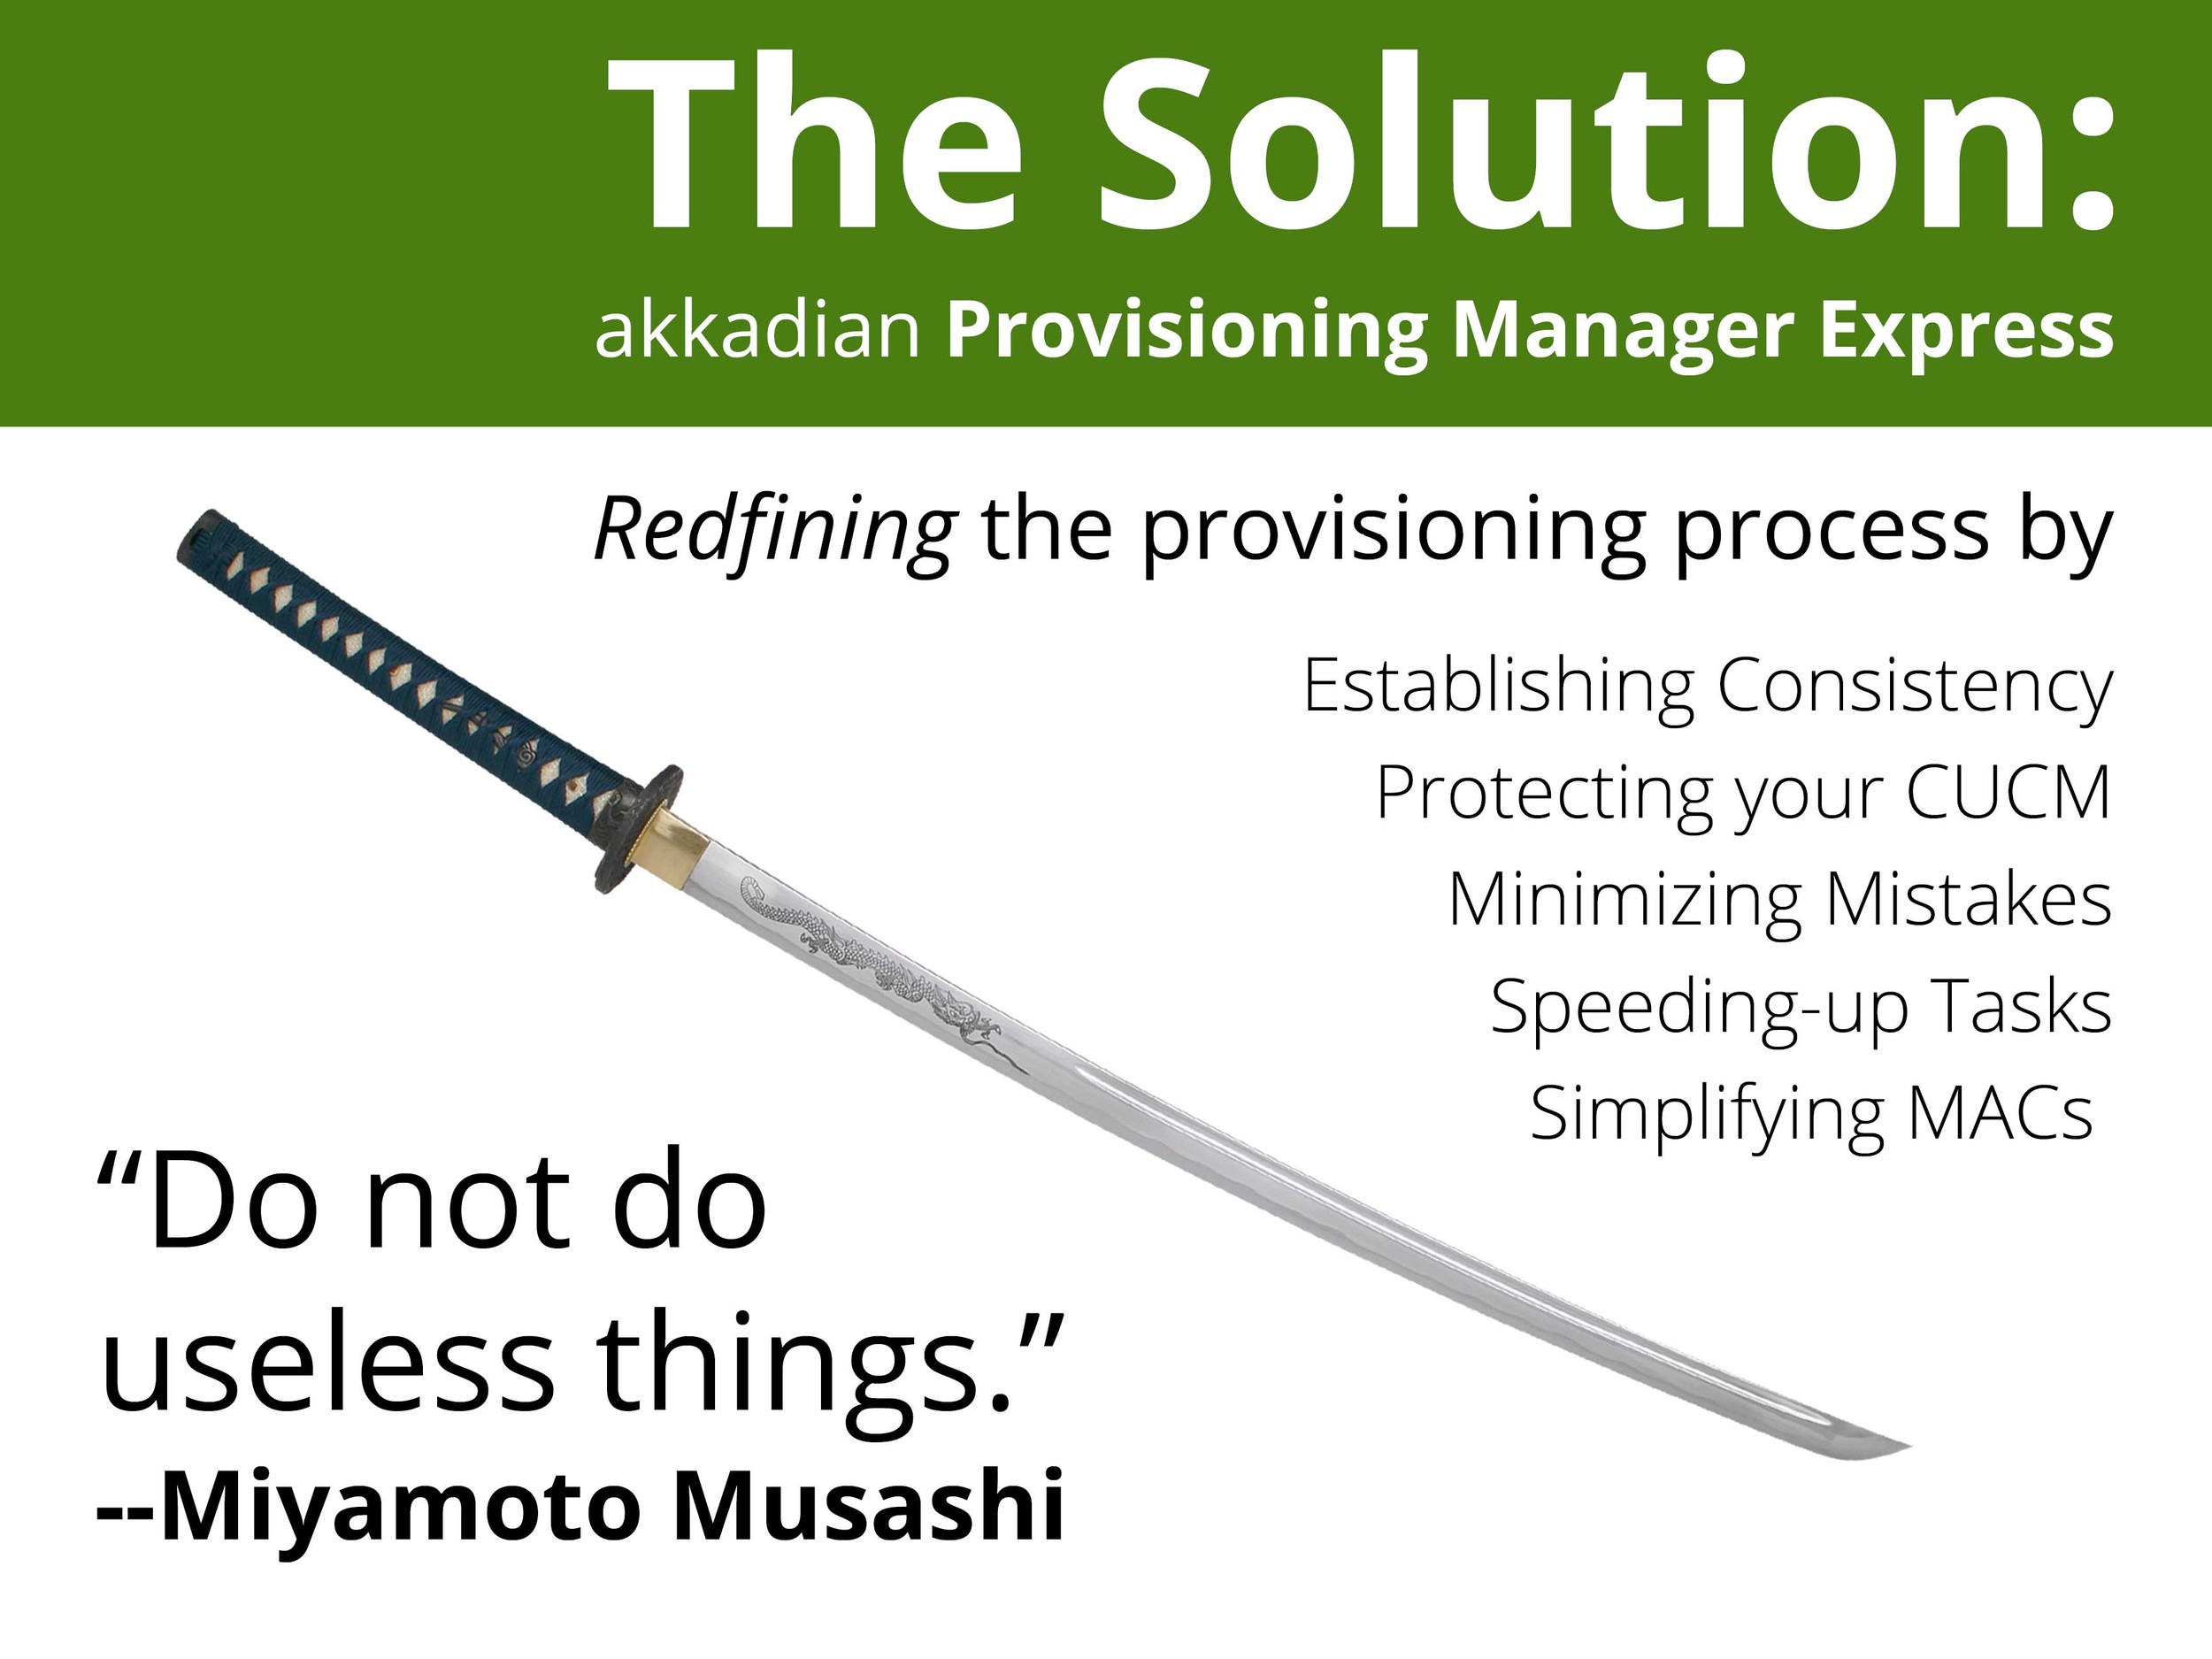 b2b presentation on provisioning solution.jpg